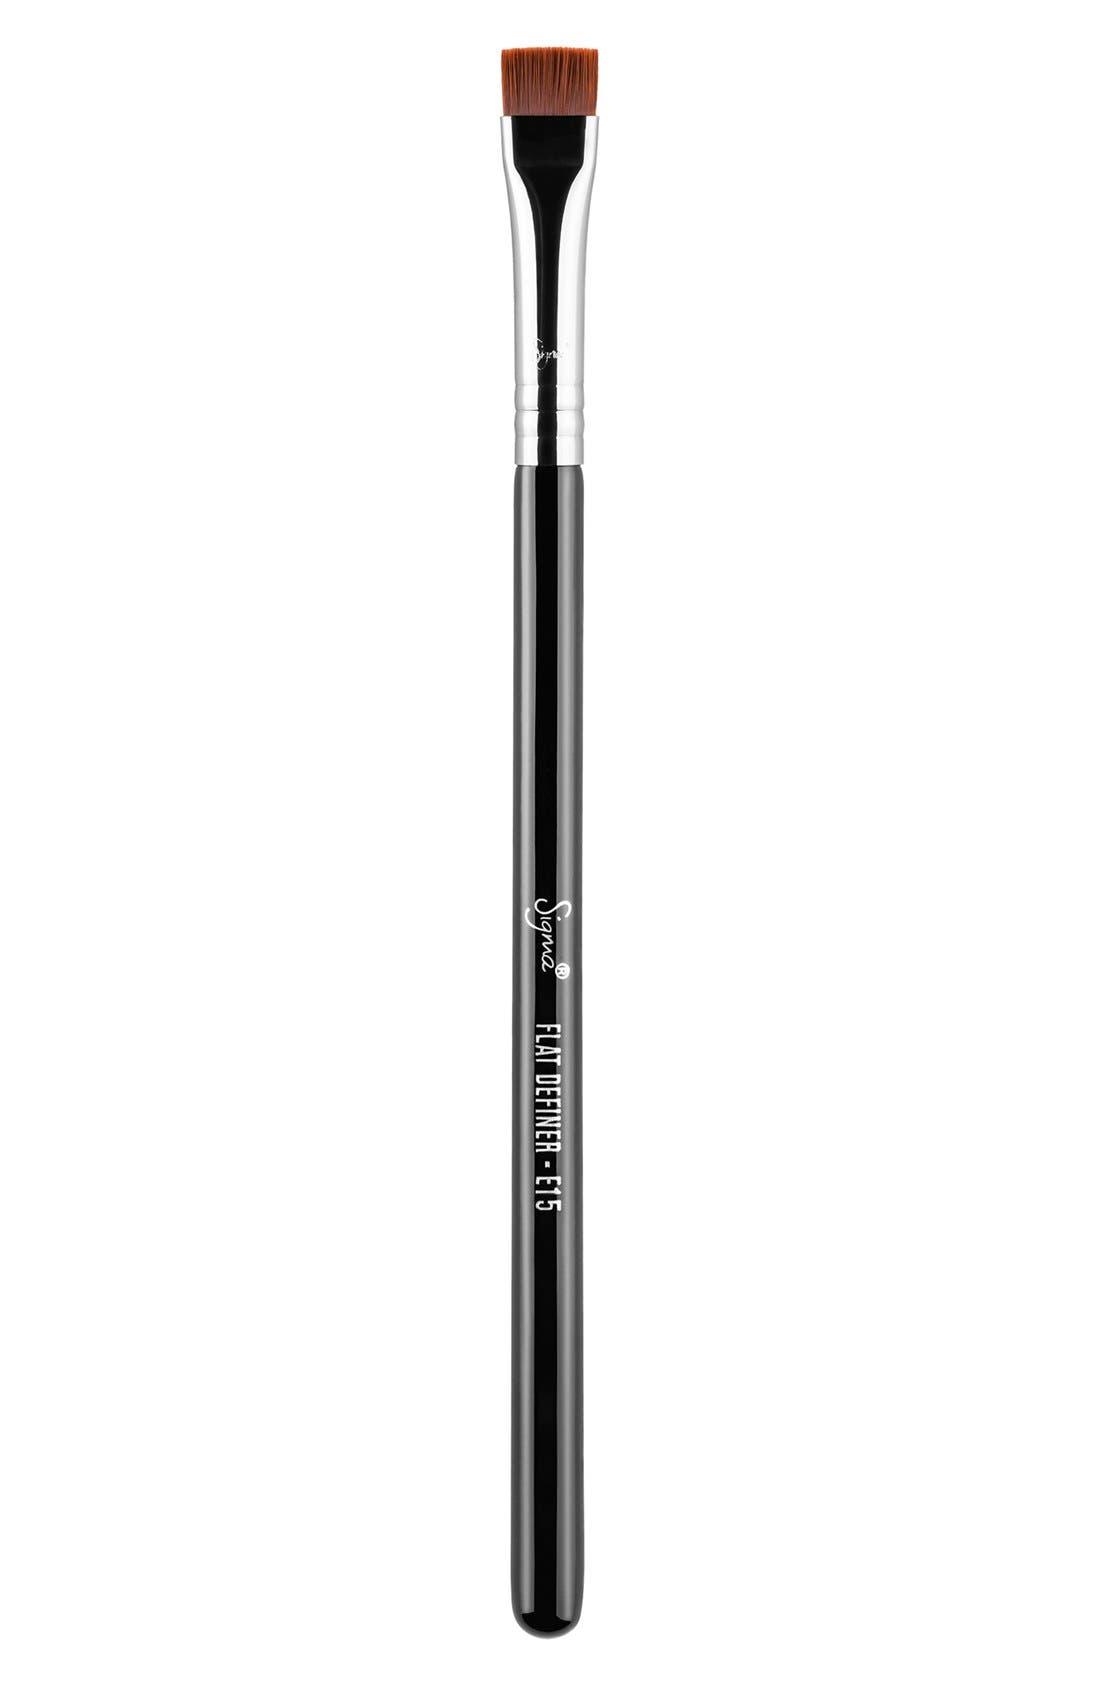 E15 Flat Definer Brush,                             Main thumbnail 1, color,                             NO COLOR